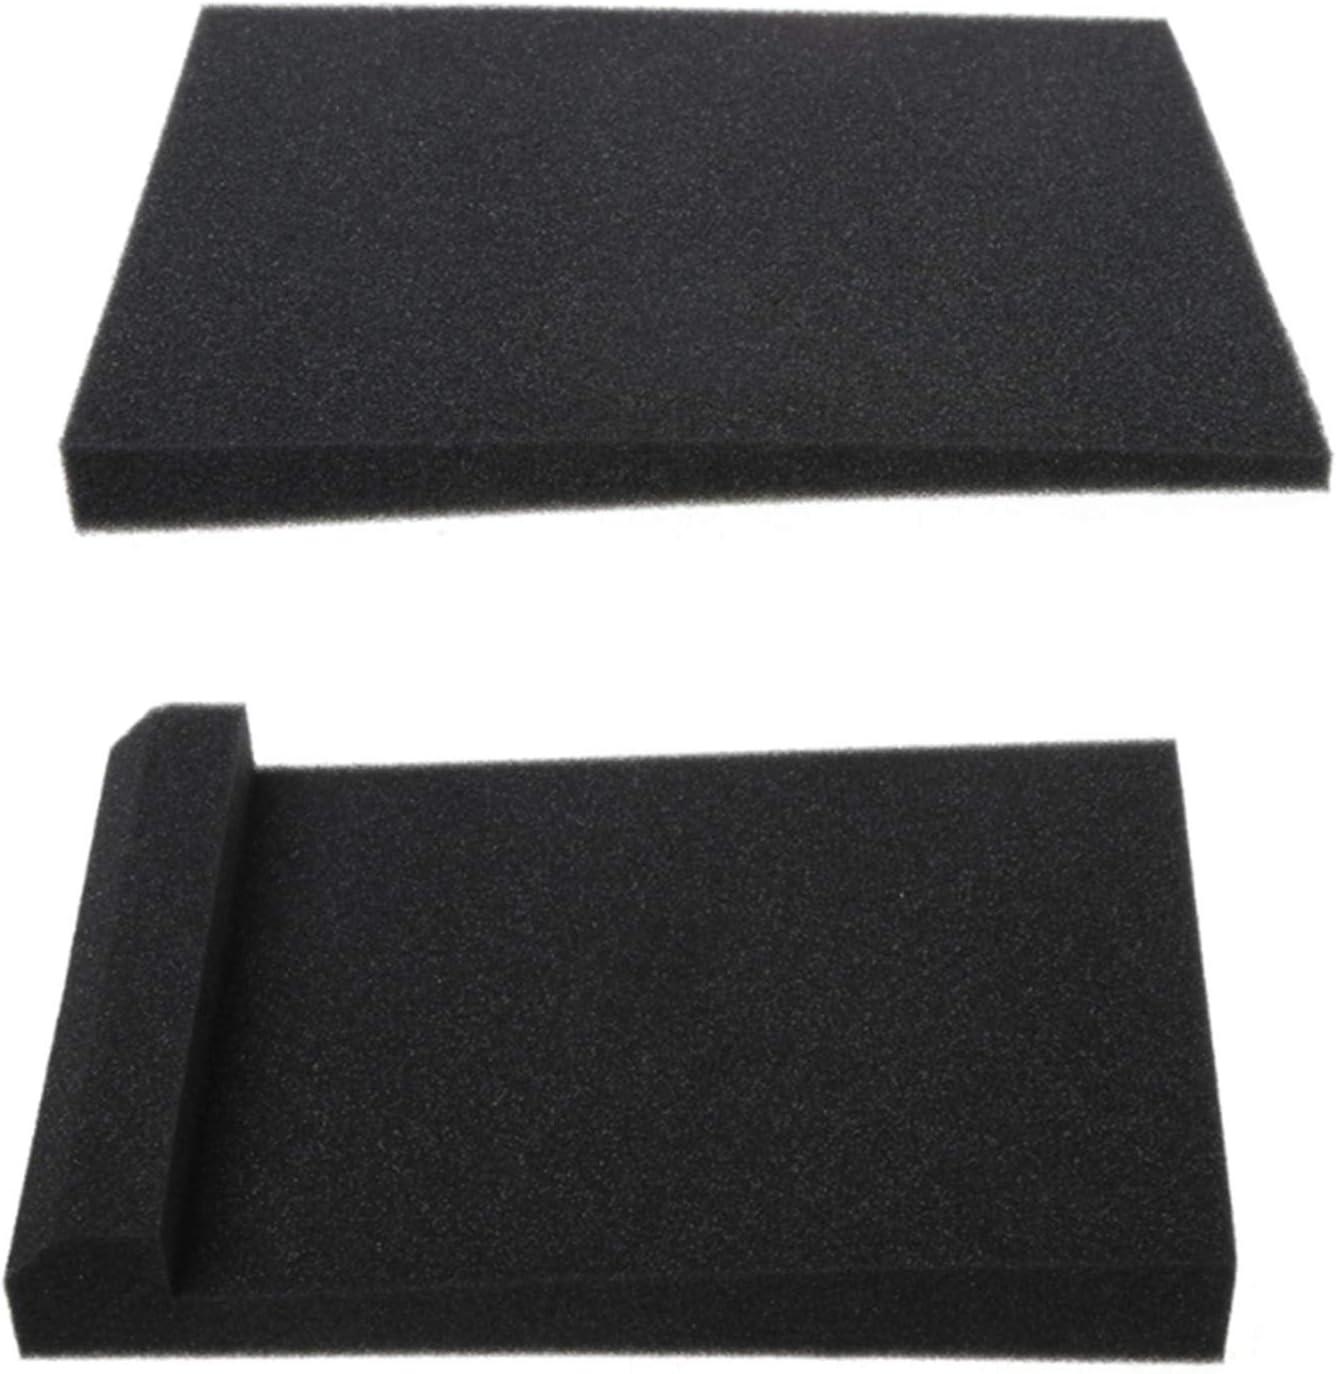 Vaorwne 1 Set 2pcs Sponge Studio Monitor Speaker Acoustic Isolation Foam Isolator Pads Soundproofing Foam 11 8x7 8x1 8inch Amazon Com